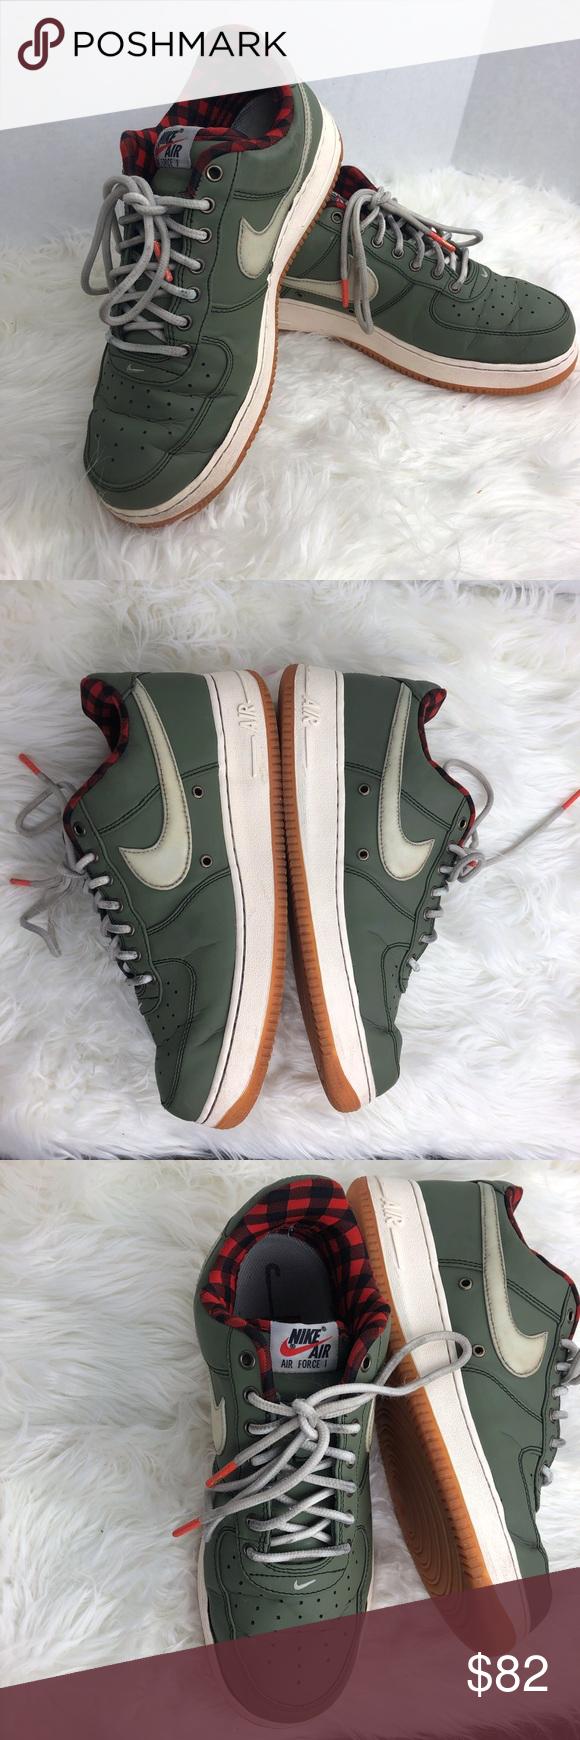 ⬇️Nike Retro Air force 1 LV 08 olive and plaid Nike